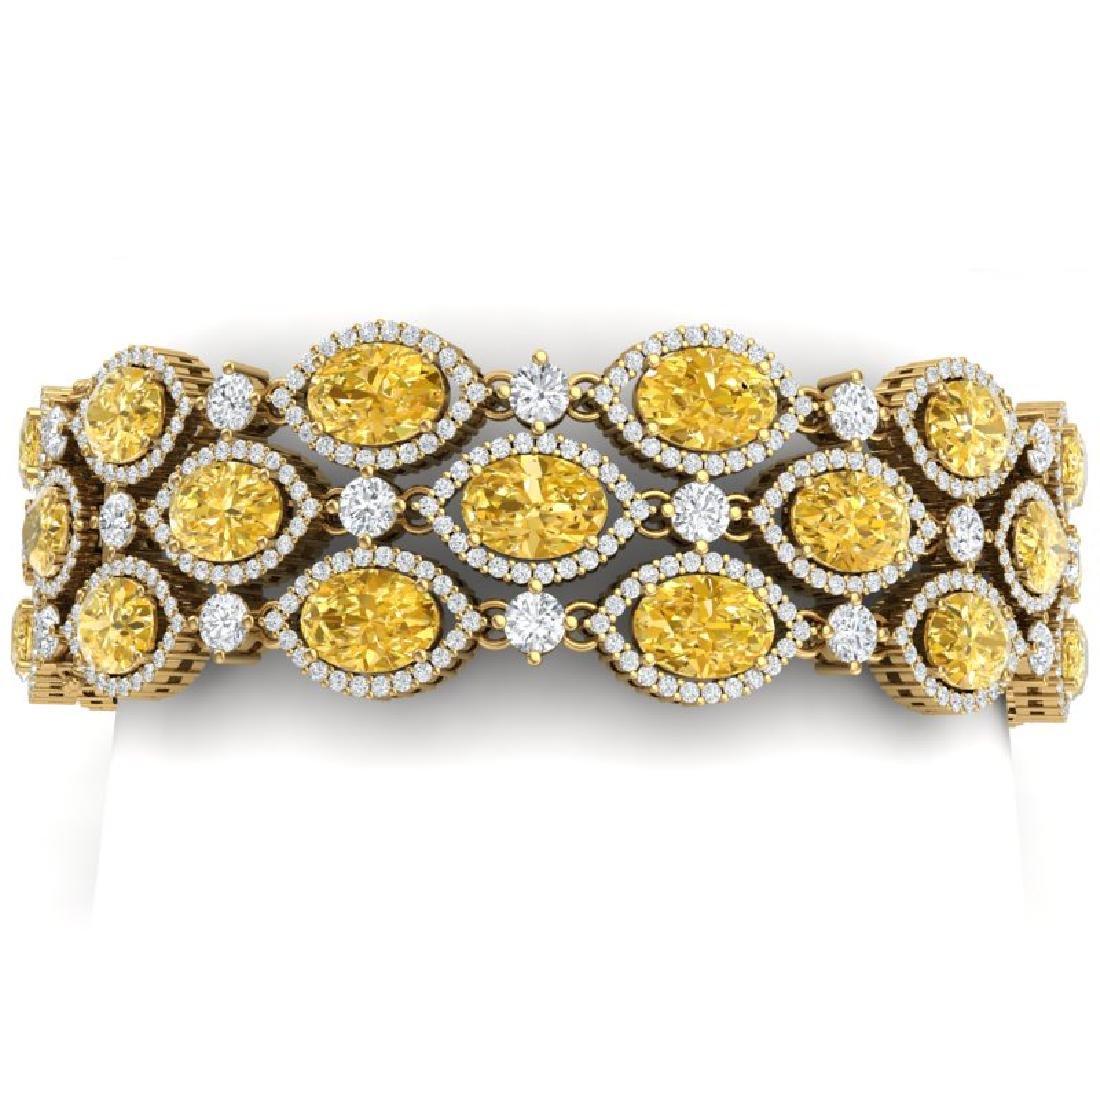 43.84 CTW Royalty Canary Citrine & VS Diamond Bracelet